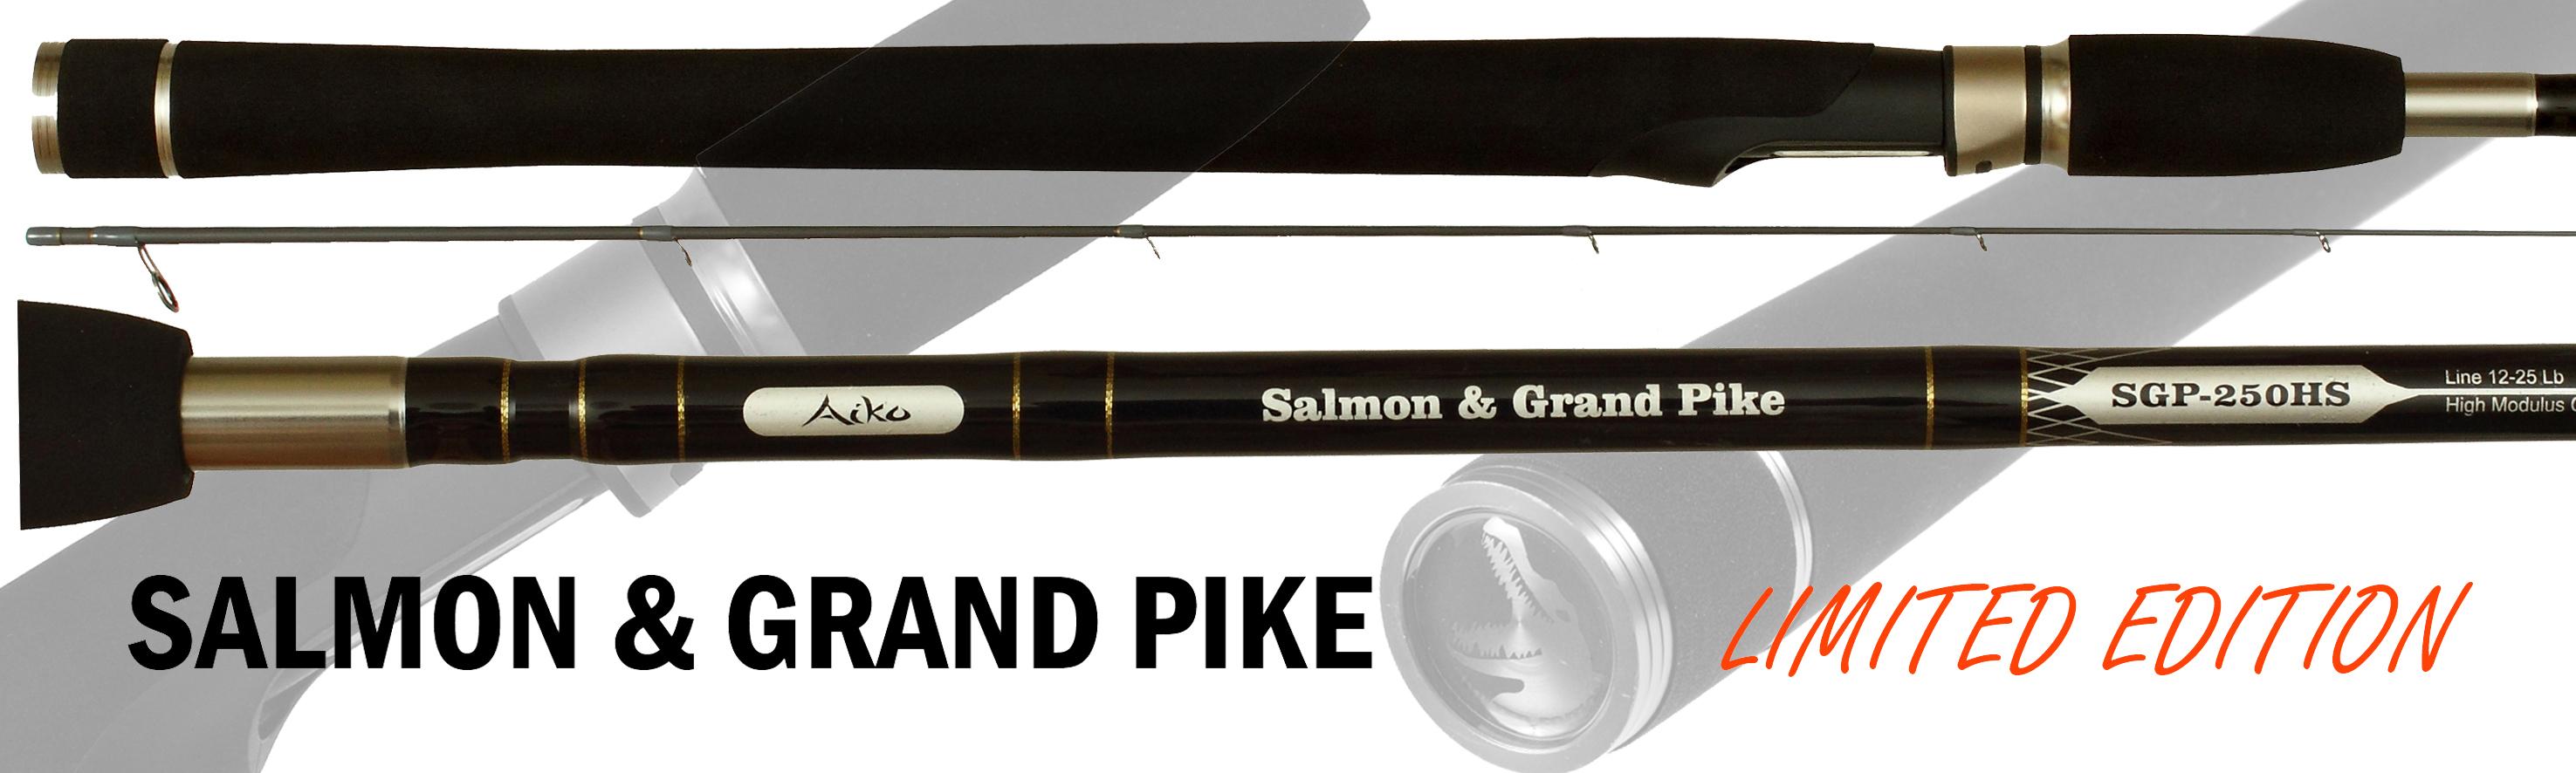 salmon-grand-pike-1